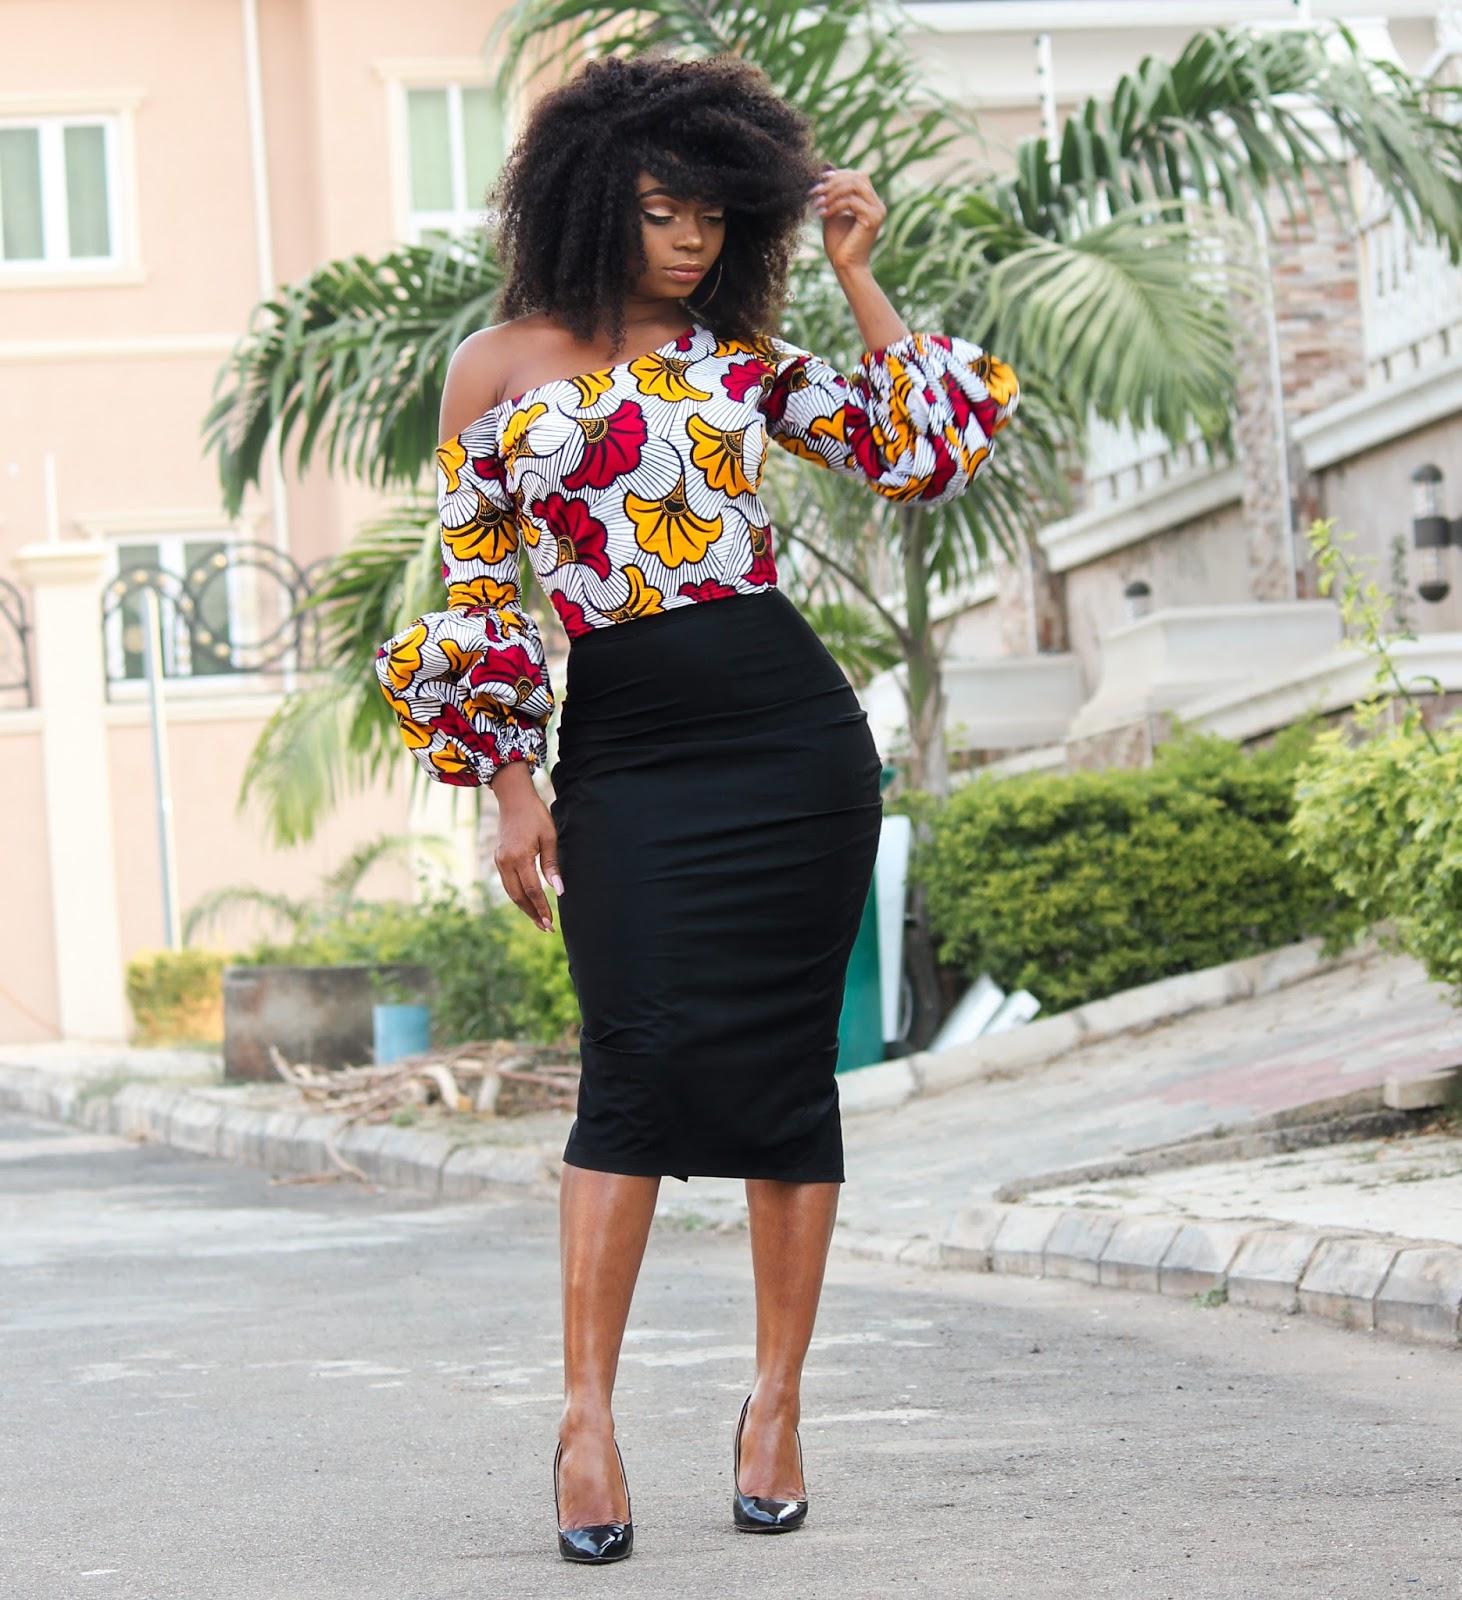 ANKARA TOP + BLACK MIDI SKIRT - African 'Kpotuba' Print Skewed Neckline Top with Black Midi Skirt with Zara Court Shoes